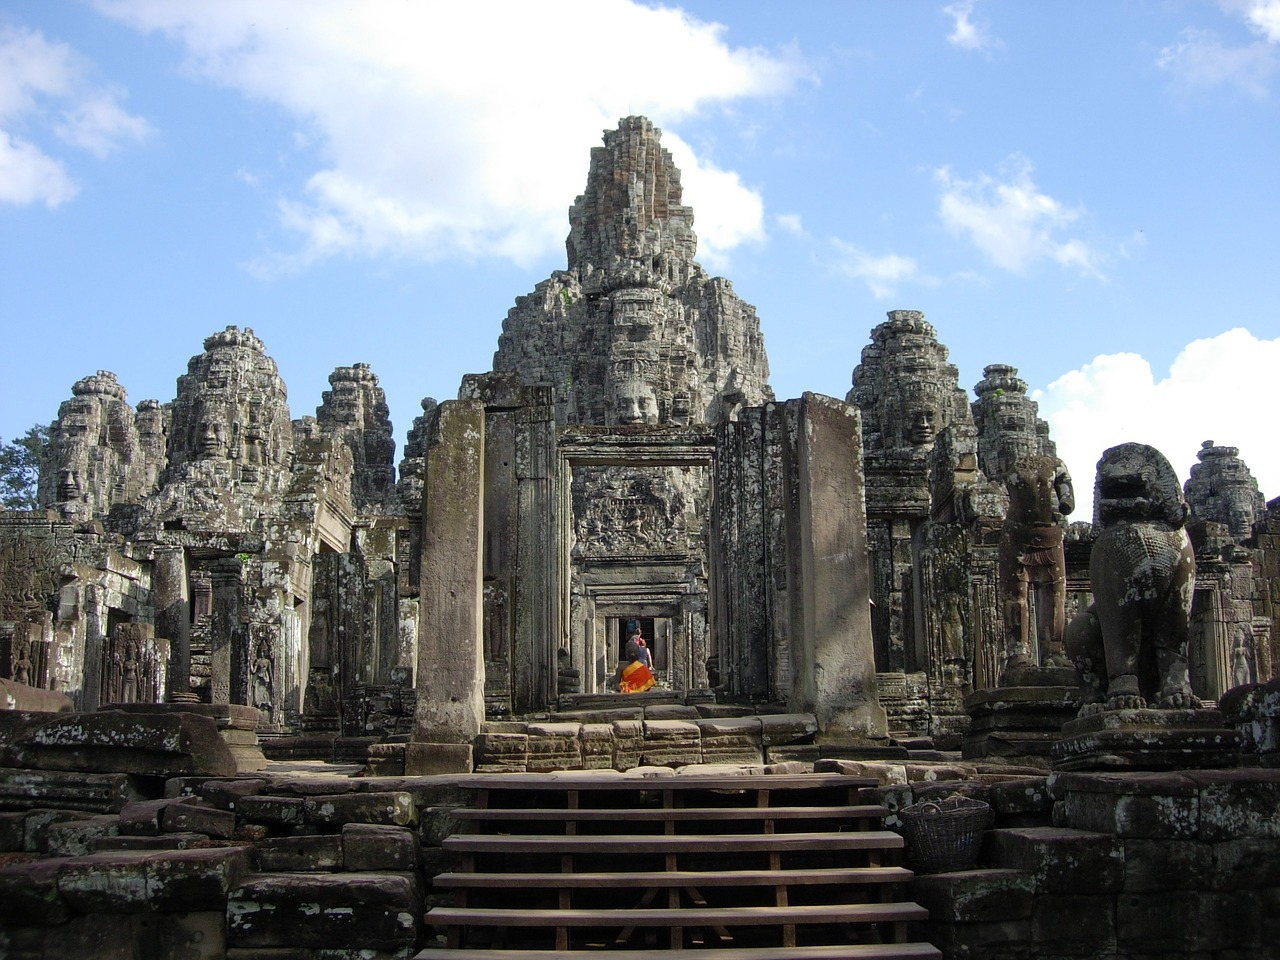 Siem Reap - Top Weekend Getaways in Cambodia That You Must Not Miss